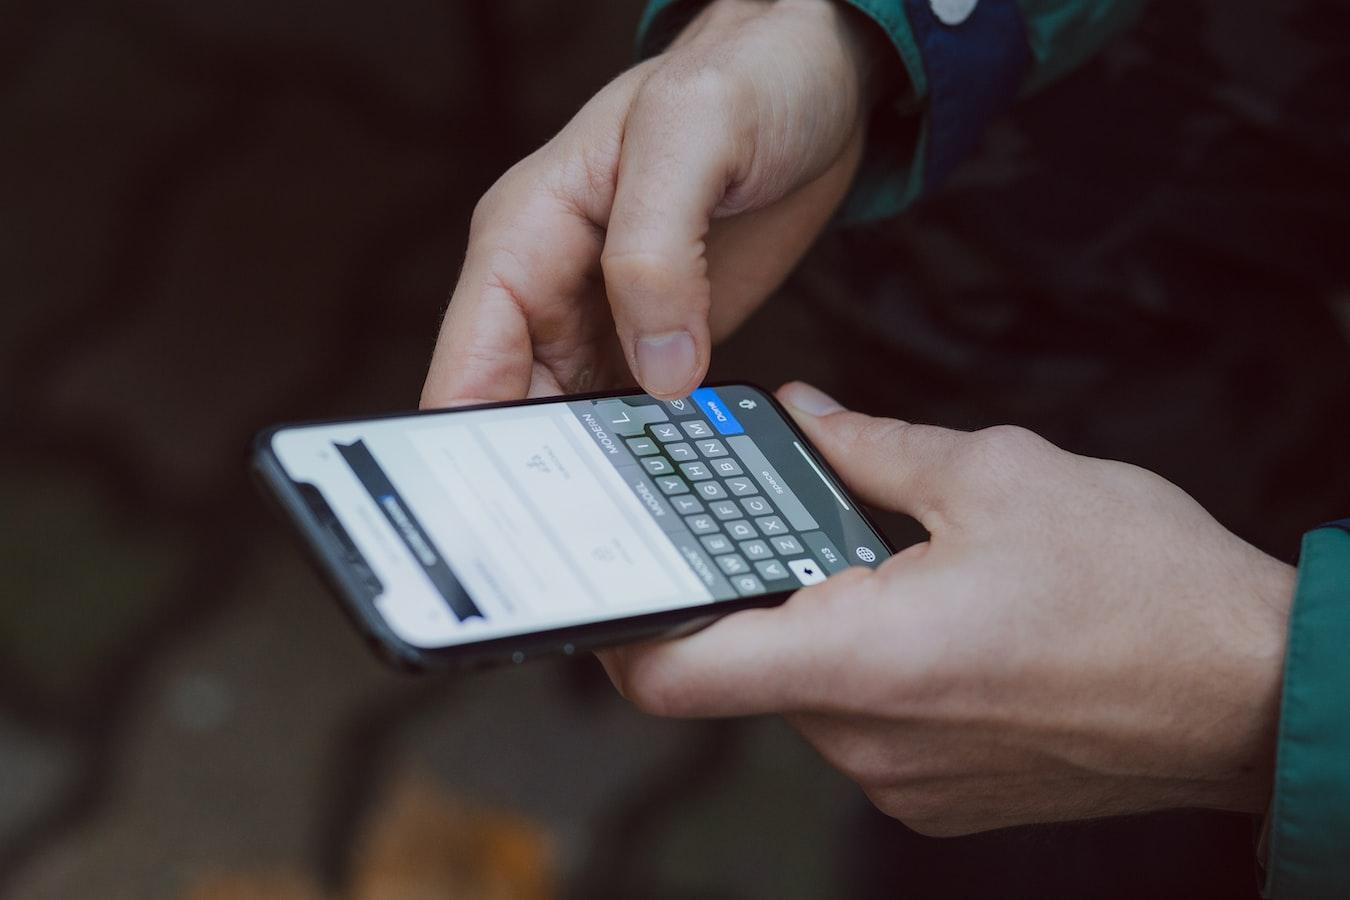 konsentrasi terganggu karena smartphone